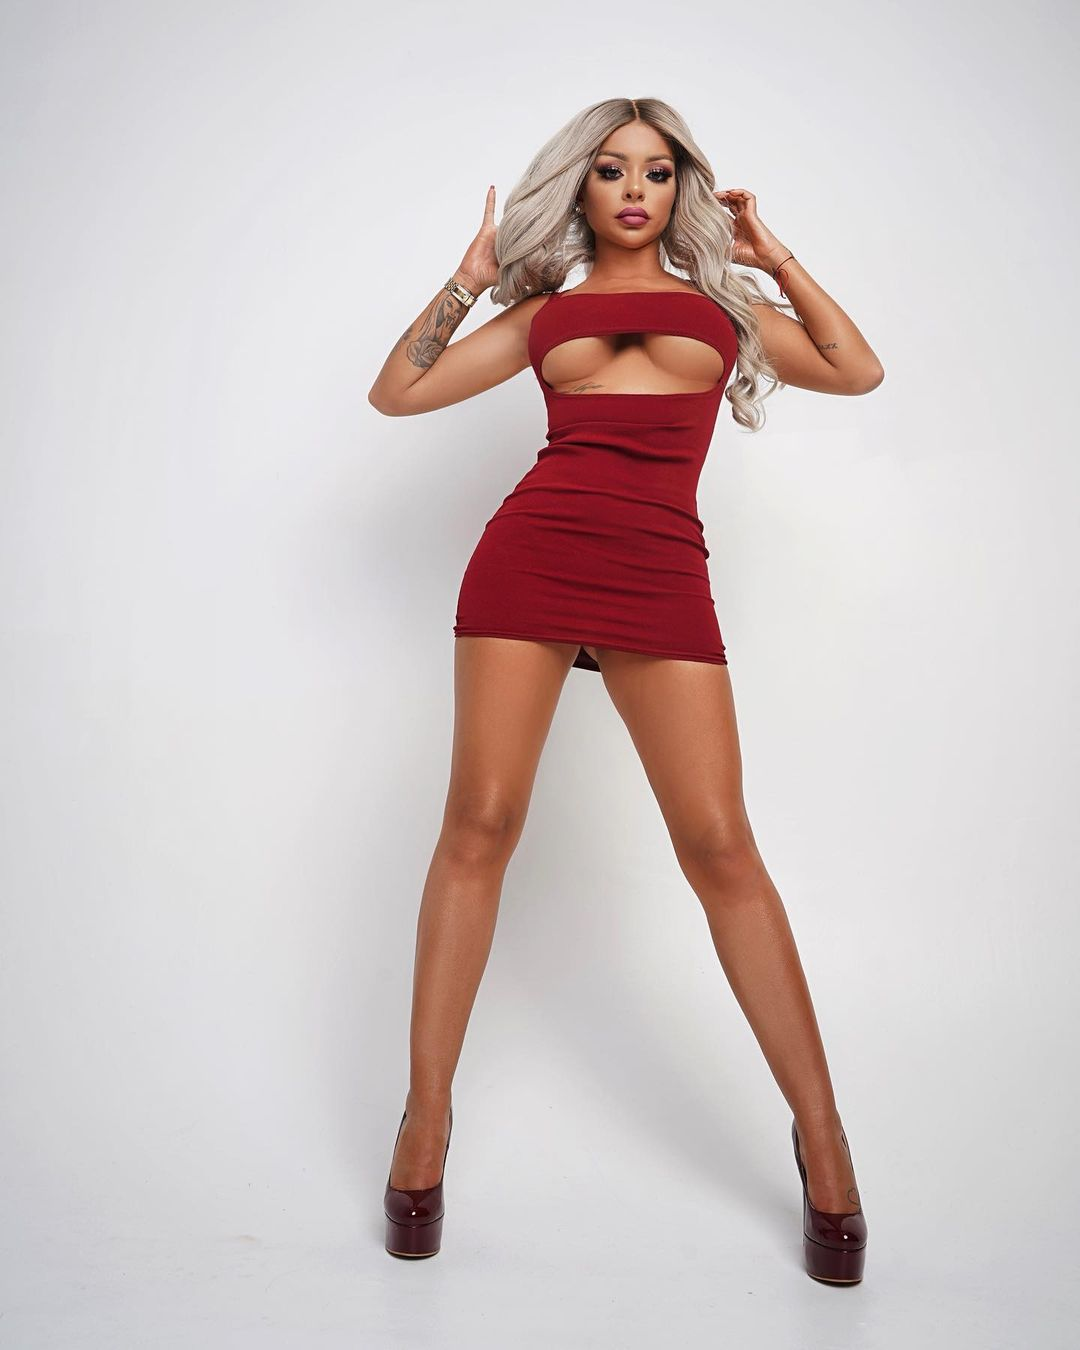 Katja Krasavice sexy legs